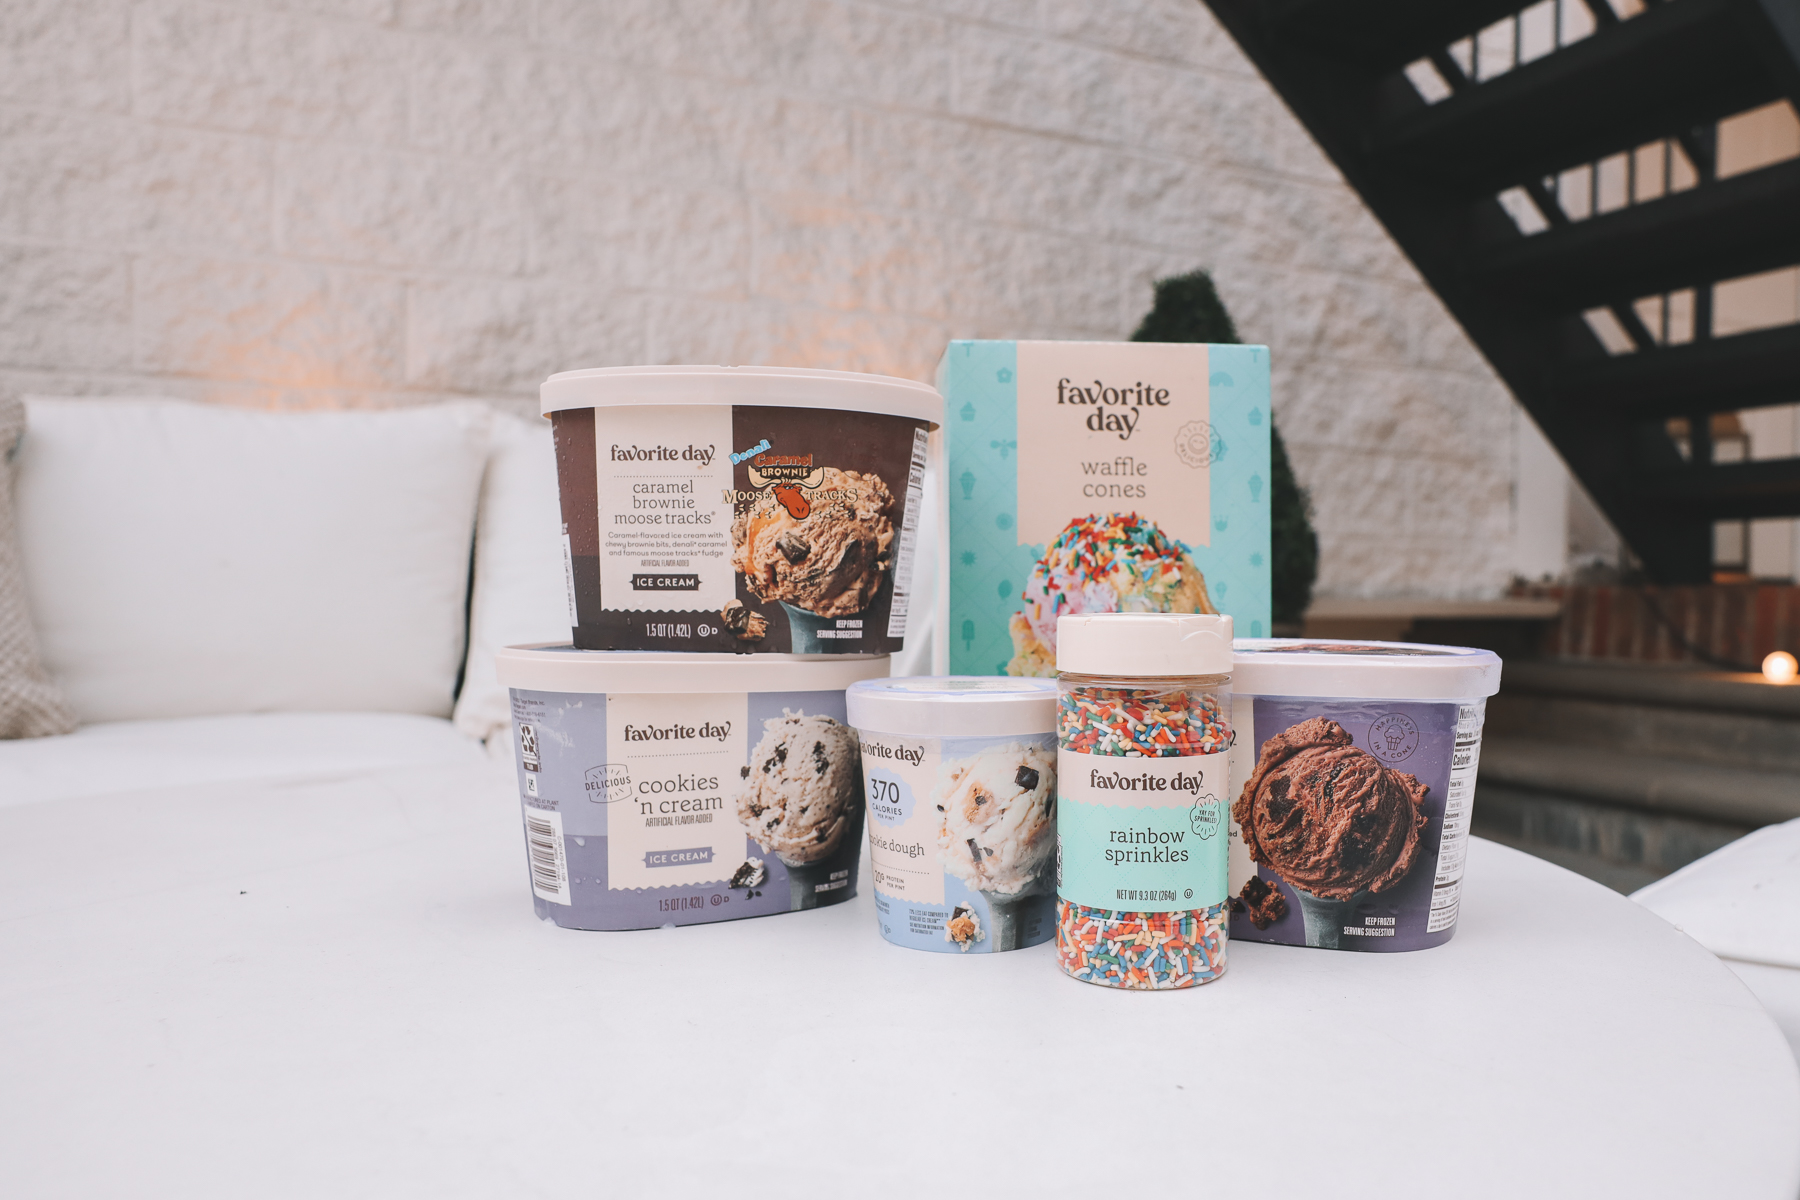 Target Favorite Day Ice Cream treats